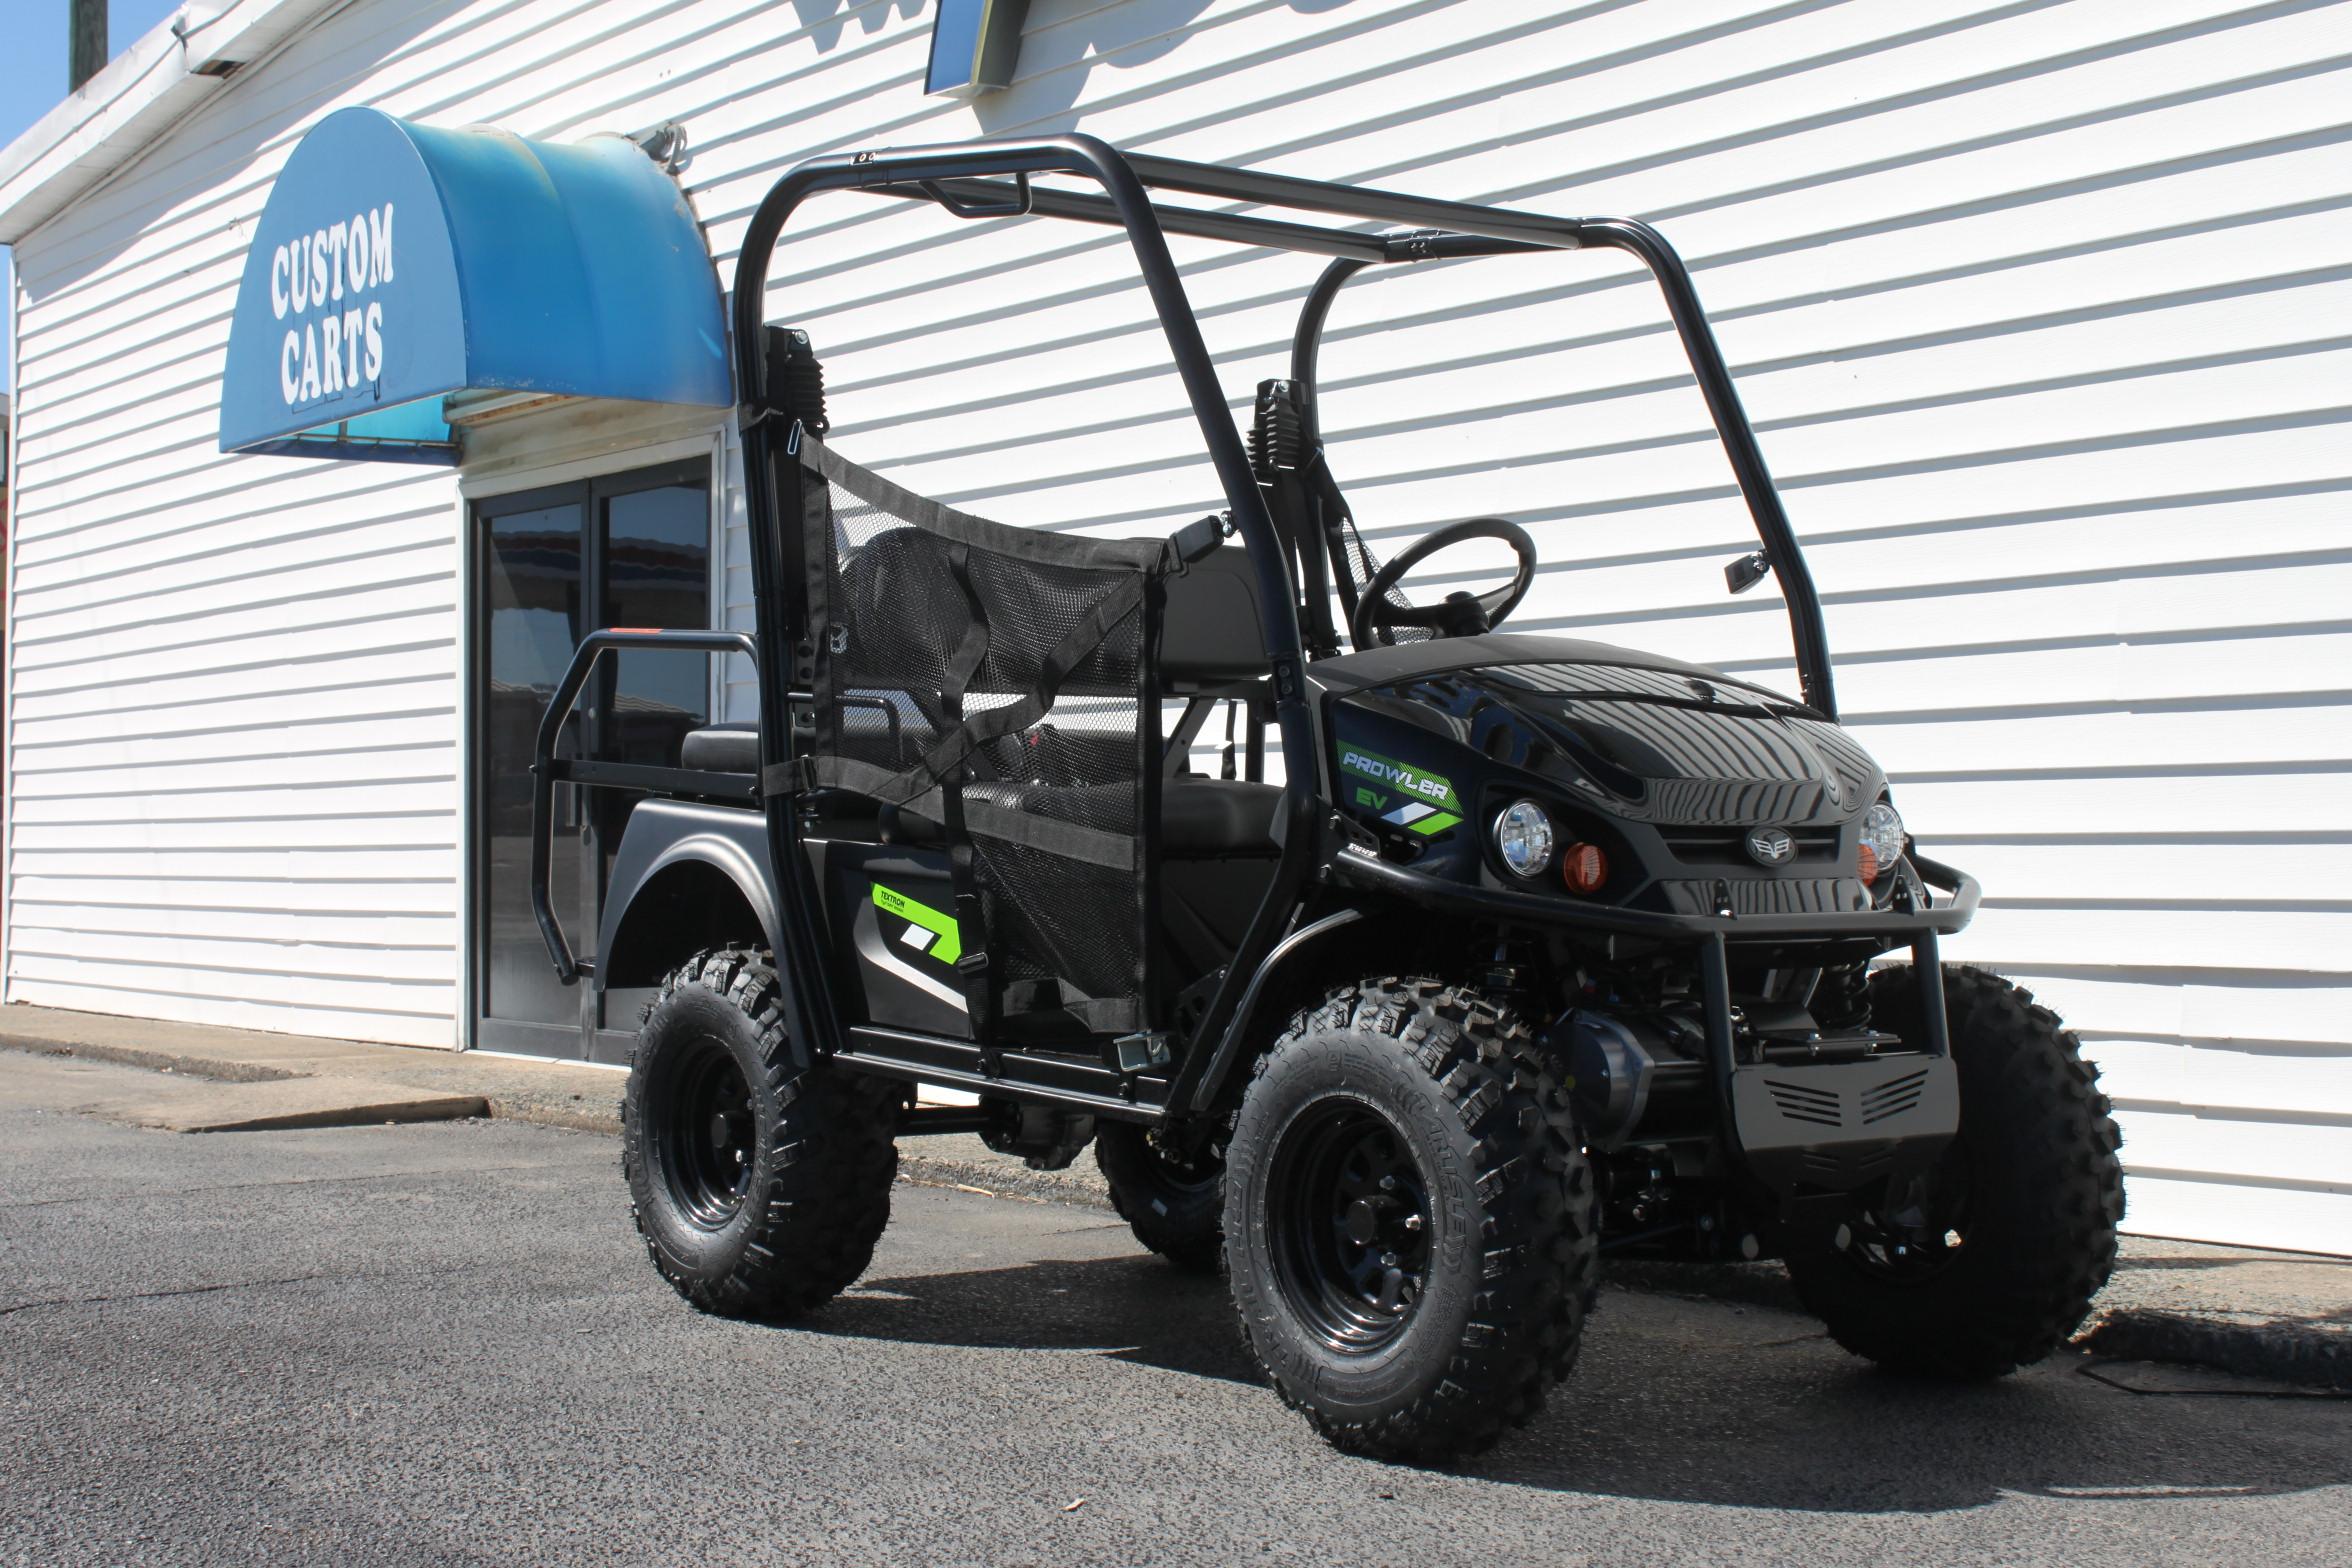 ezgo workhorse cart, 4x4 bus, 4x4 quad, 4x4 side by side, 4x4 off-road cart, 4x4 trailer, 4x4 car, 4x4 utility cart, on 4x4 golf cart build